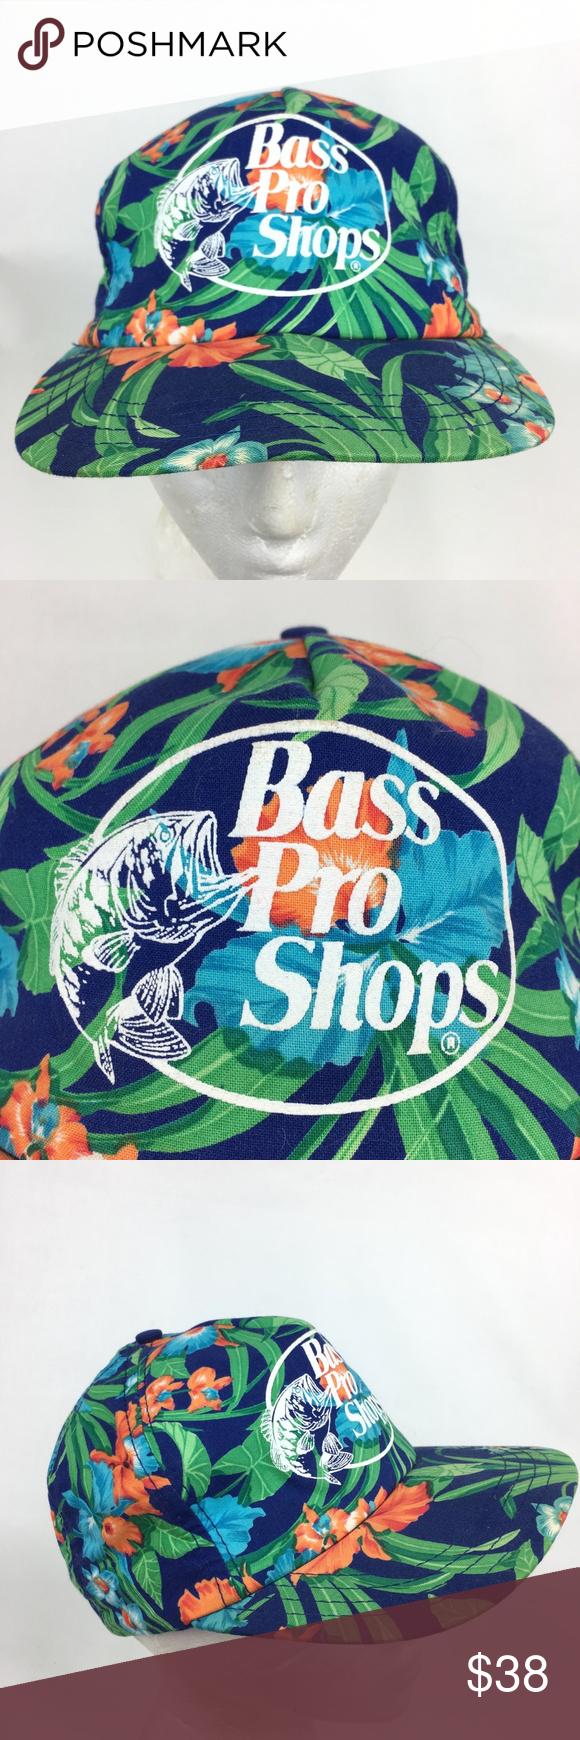 90s Bass Pro Shops Hawaiian Floral Tropical Hat Hats Vintage Clothes Design Vintage Hawaiian